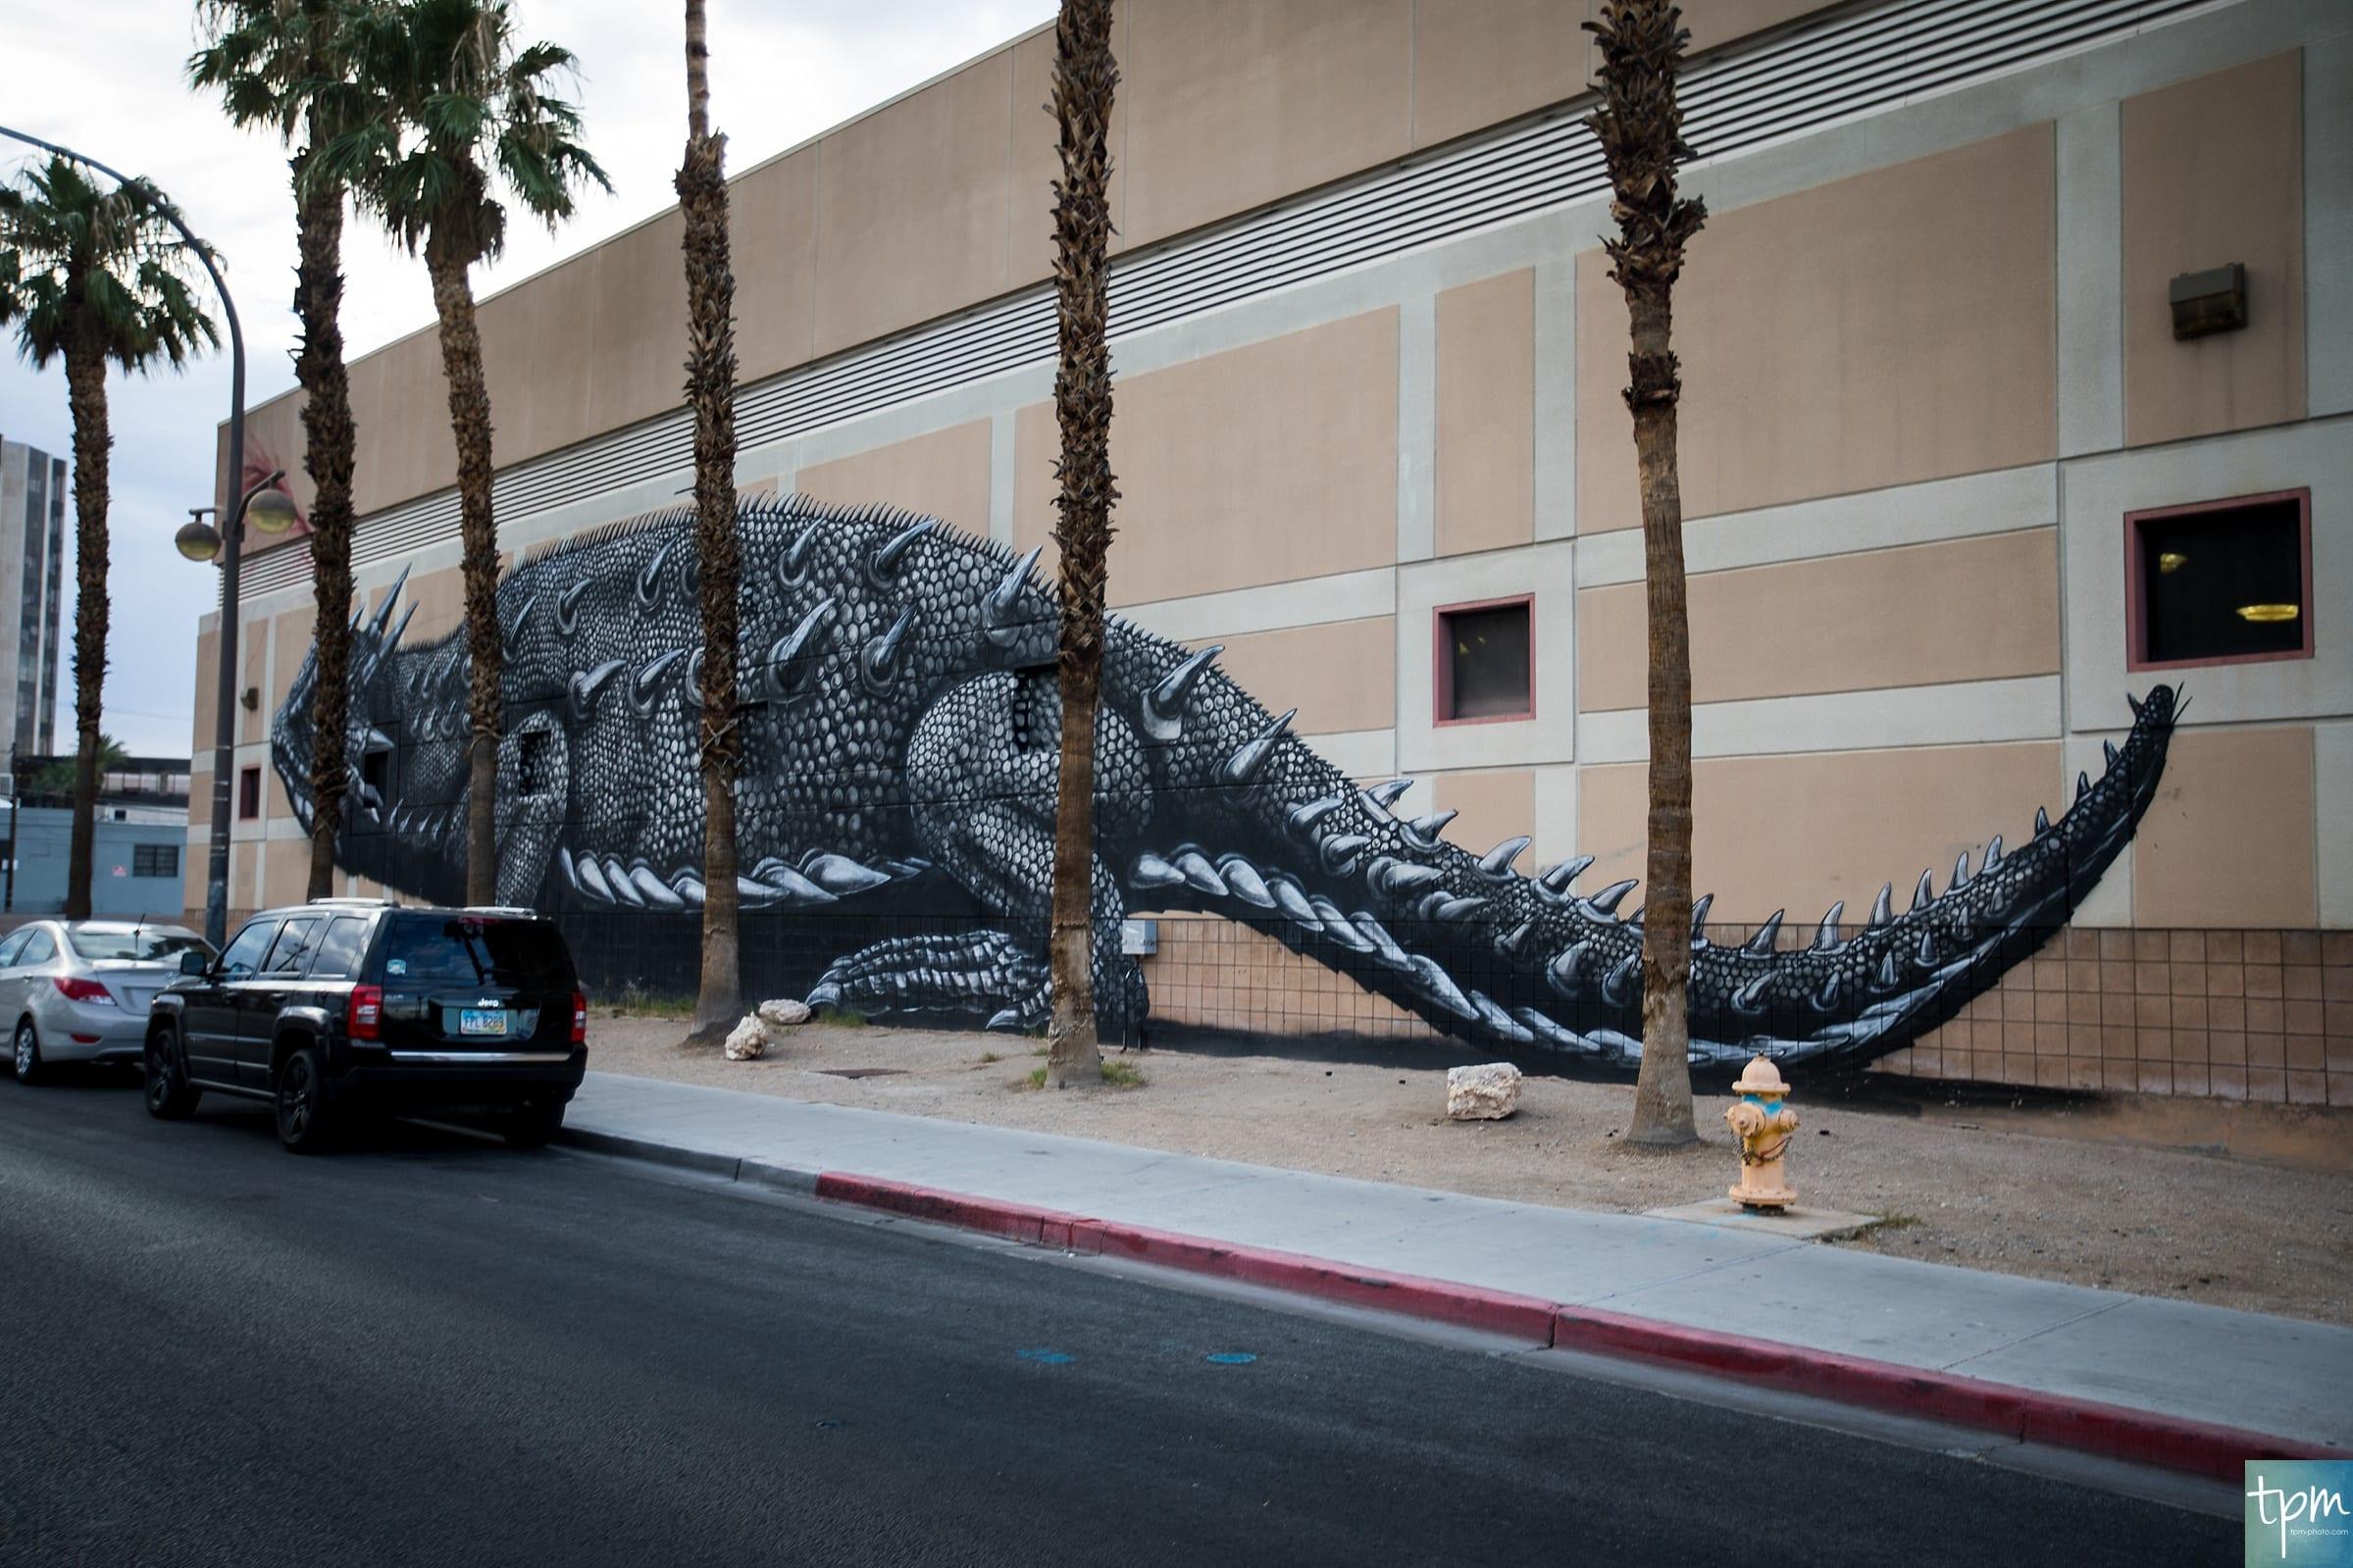 ROA, Horned Toad, Stewart Avenue, Taylored Photo Memories, Las Vegas Murals